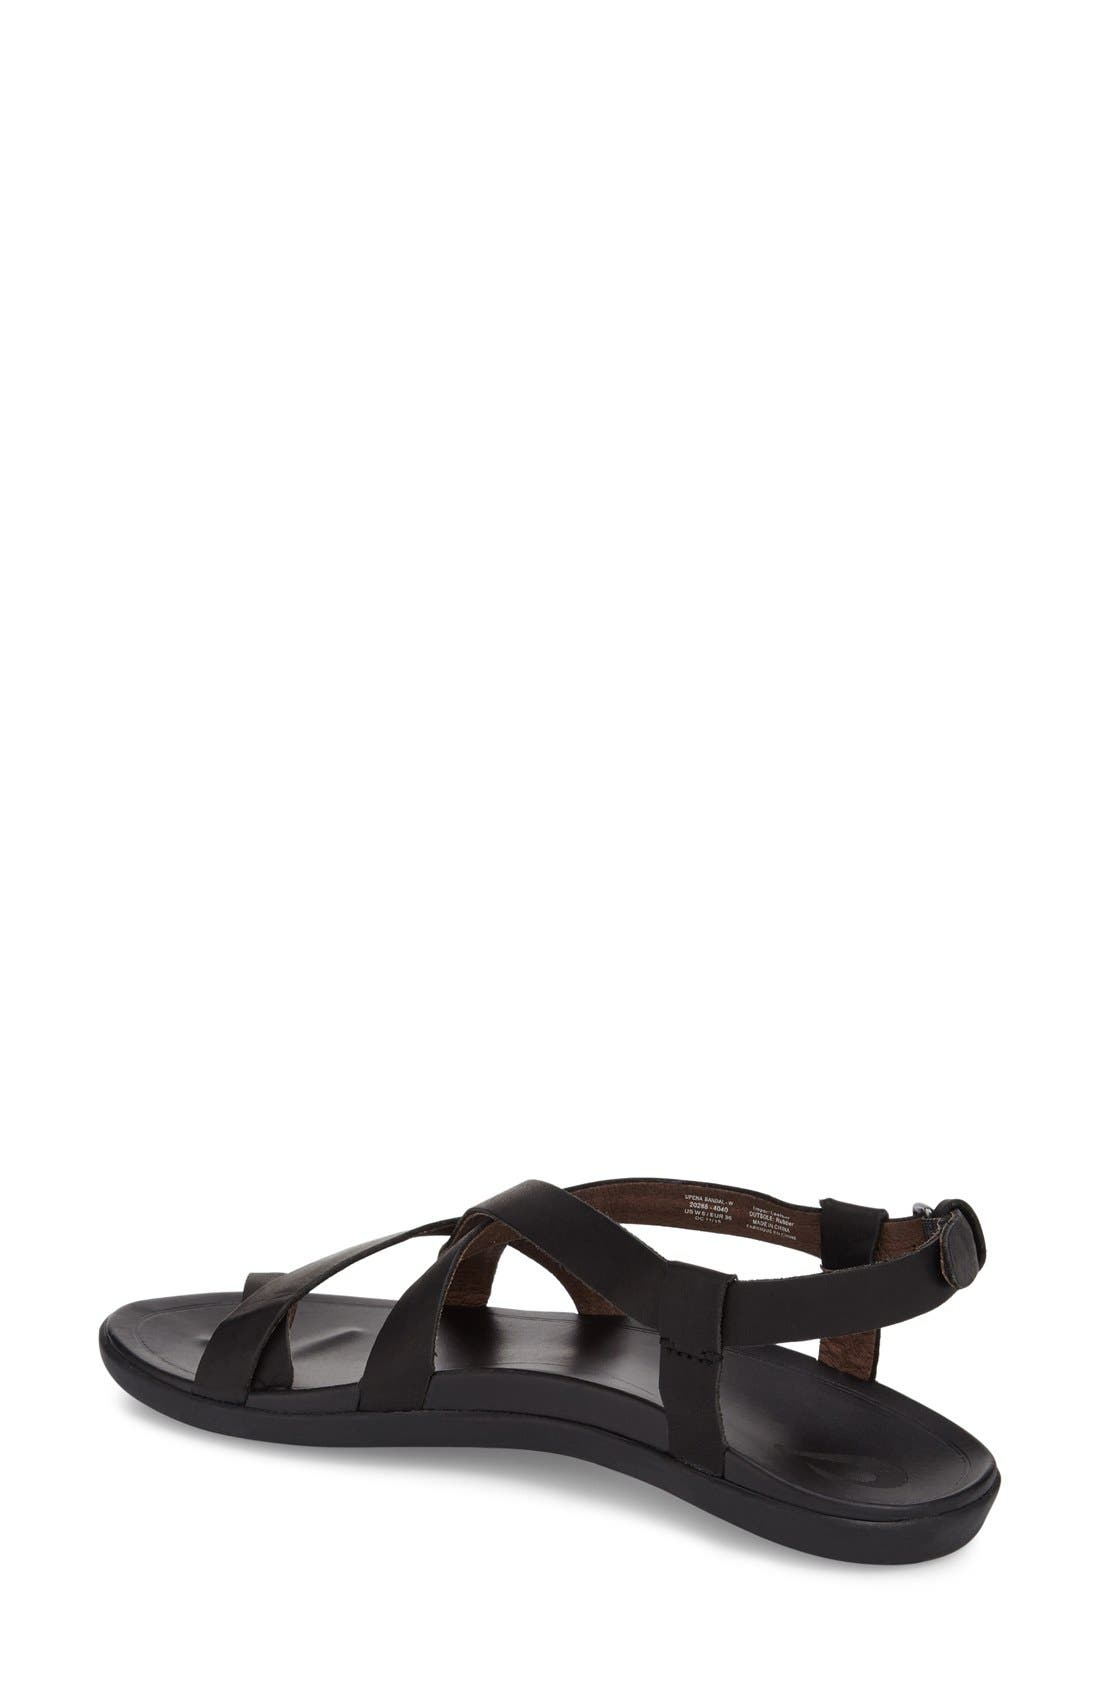 9b3ef64c109 Women s Brown Slingback Sandals